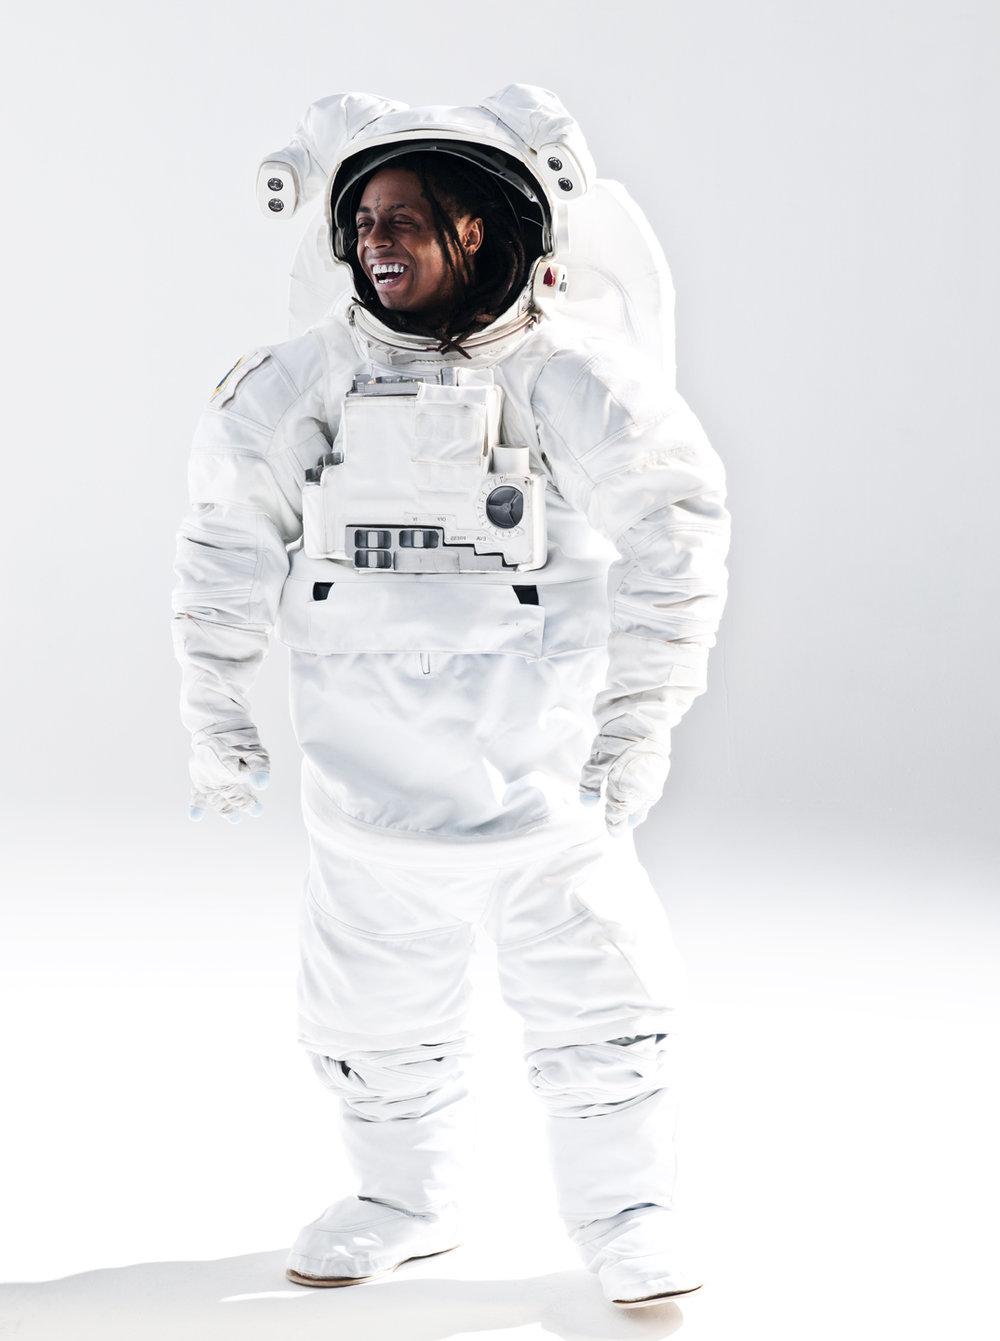 WEB03-01_02_Space_Suit_Miami_085-RT.jpg